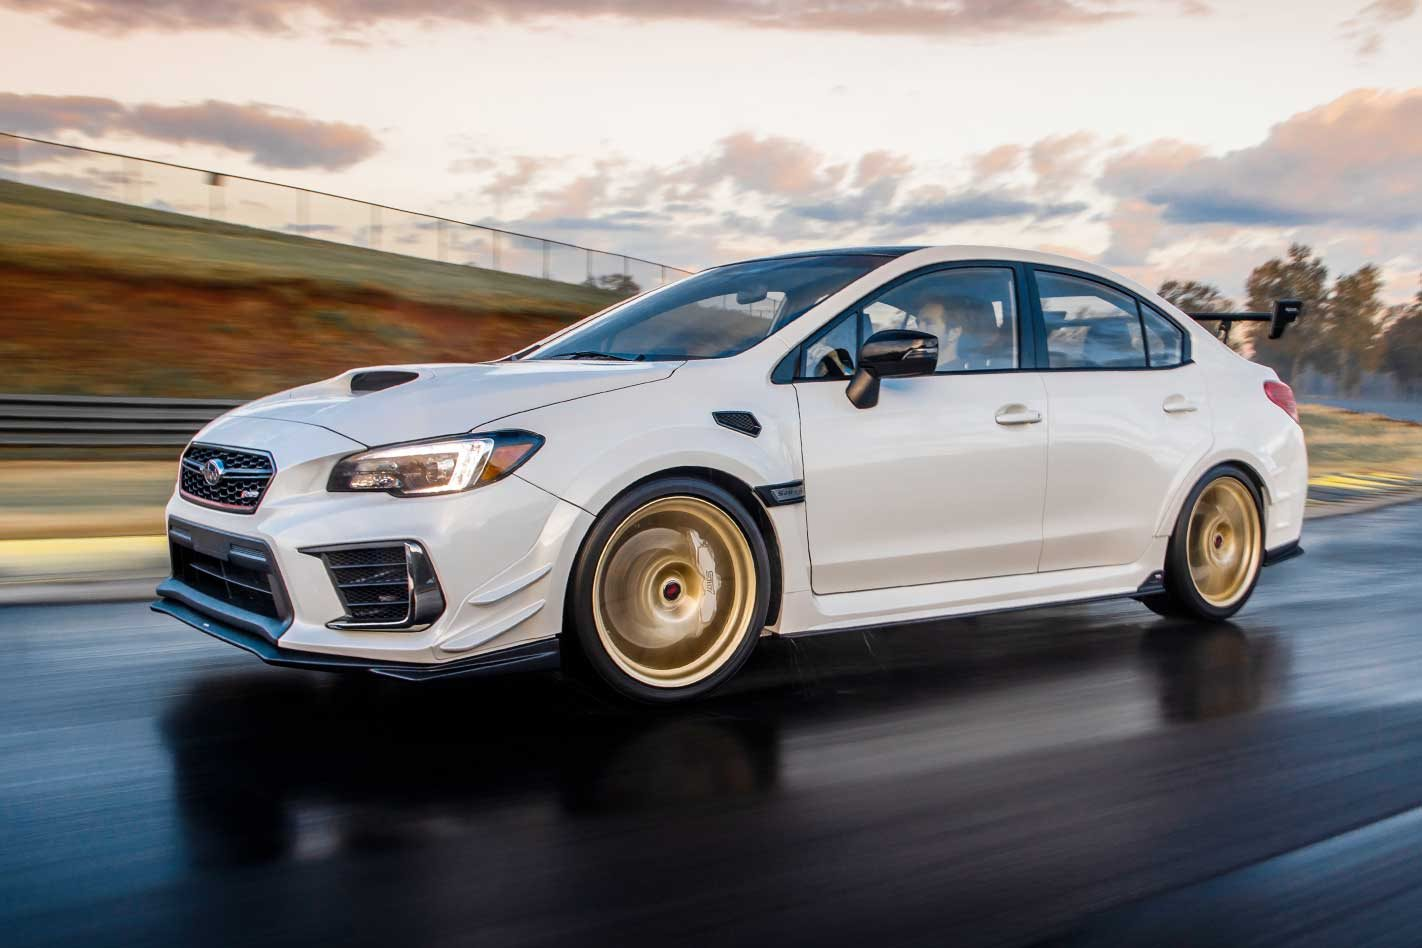 2019 Detroit Auto Show: Subaru WRX STI S209 revealed